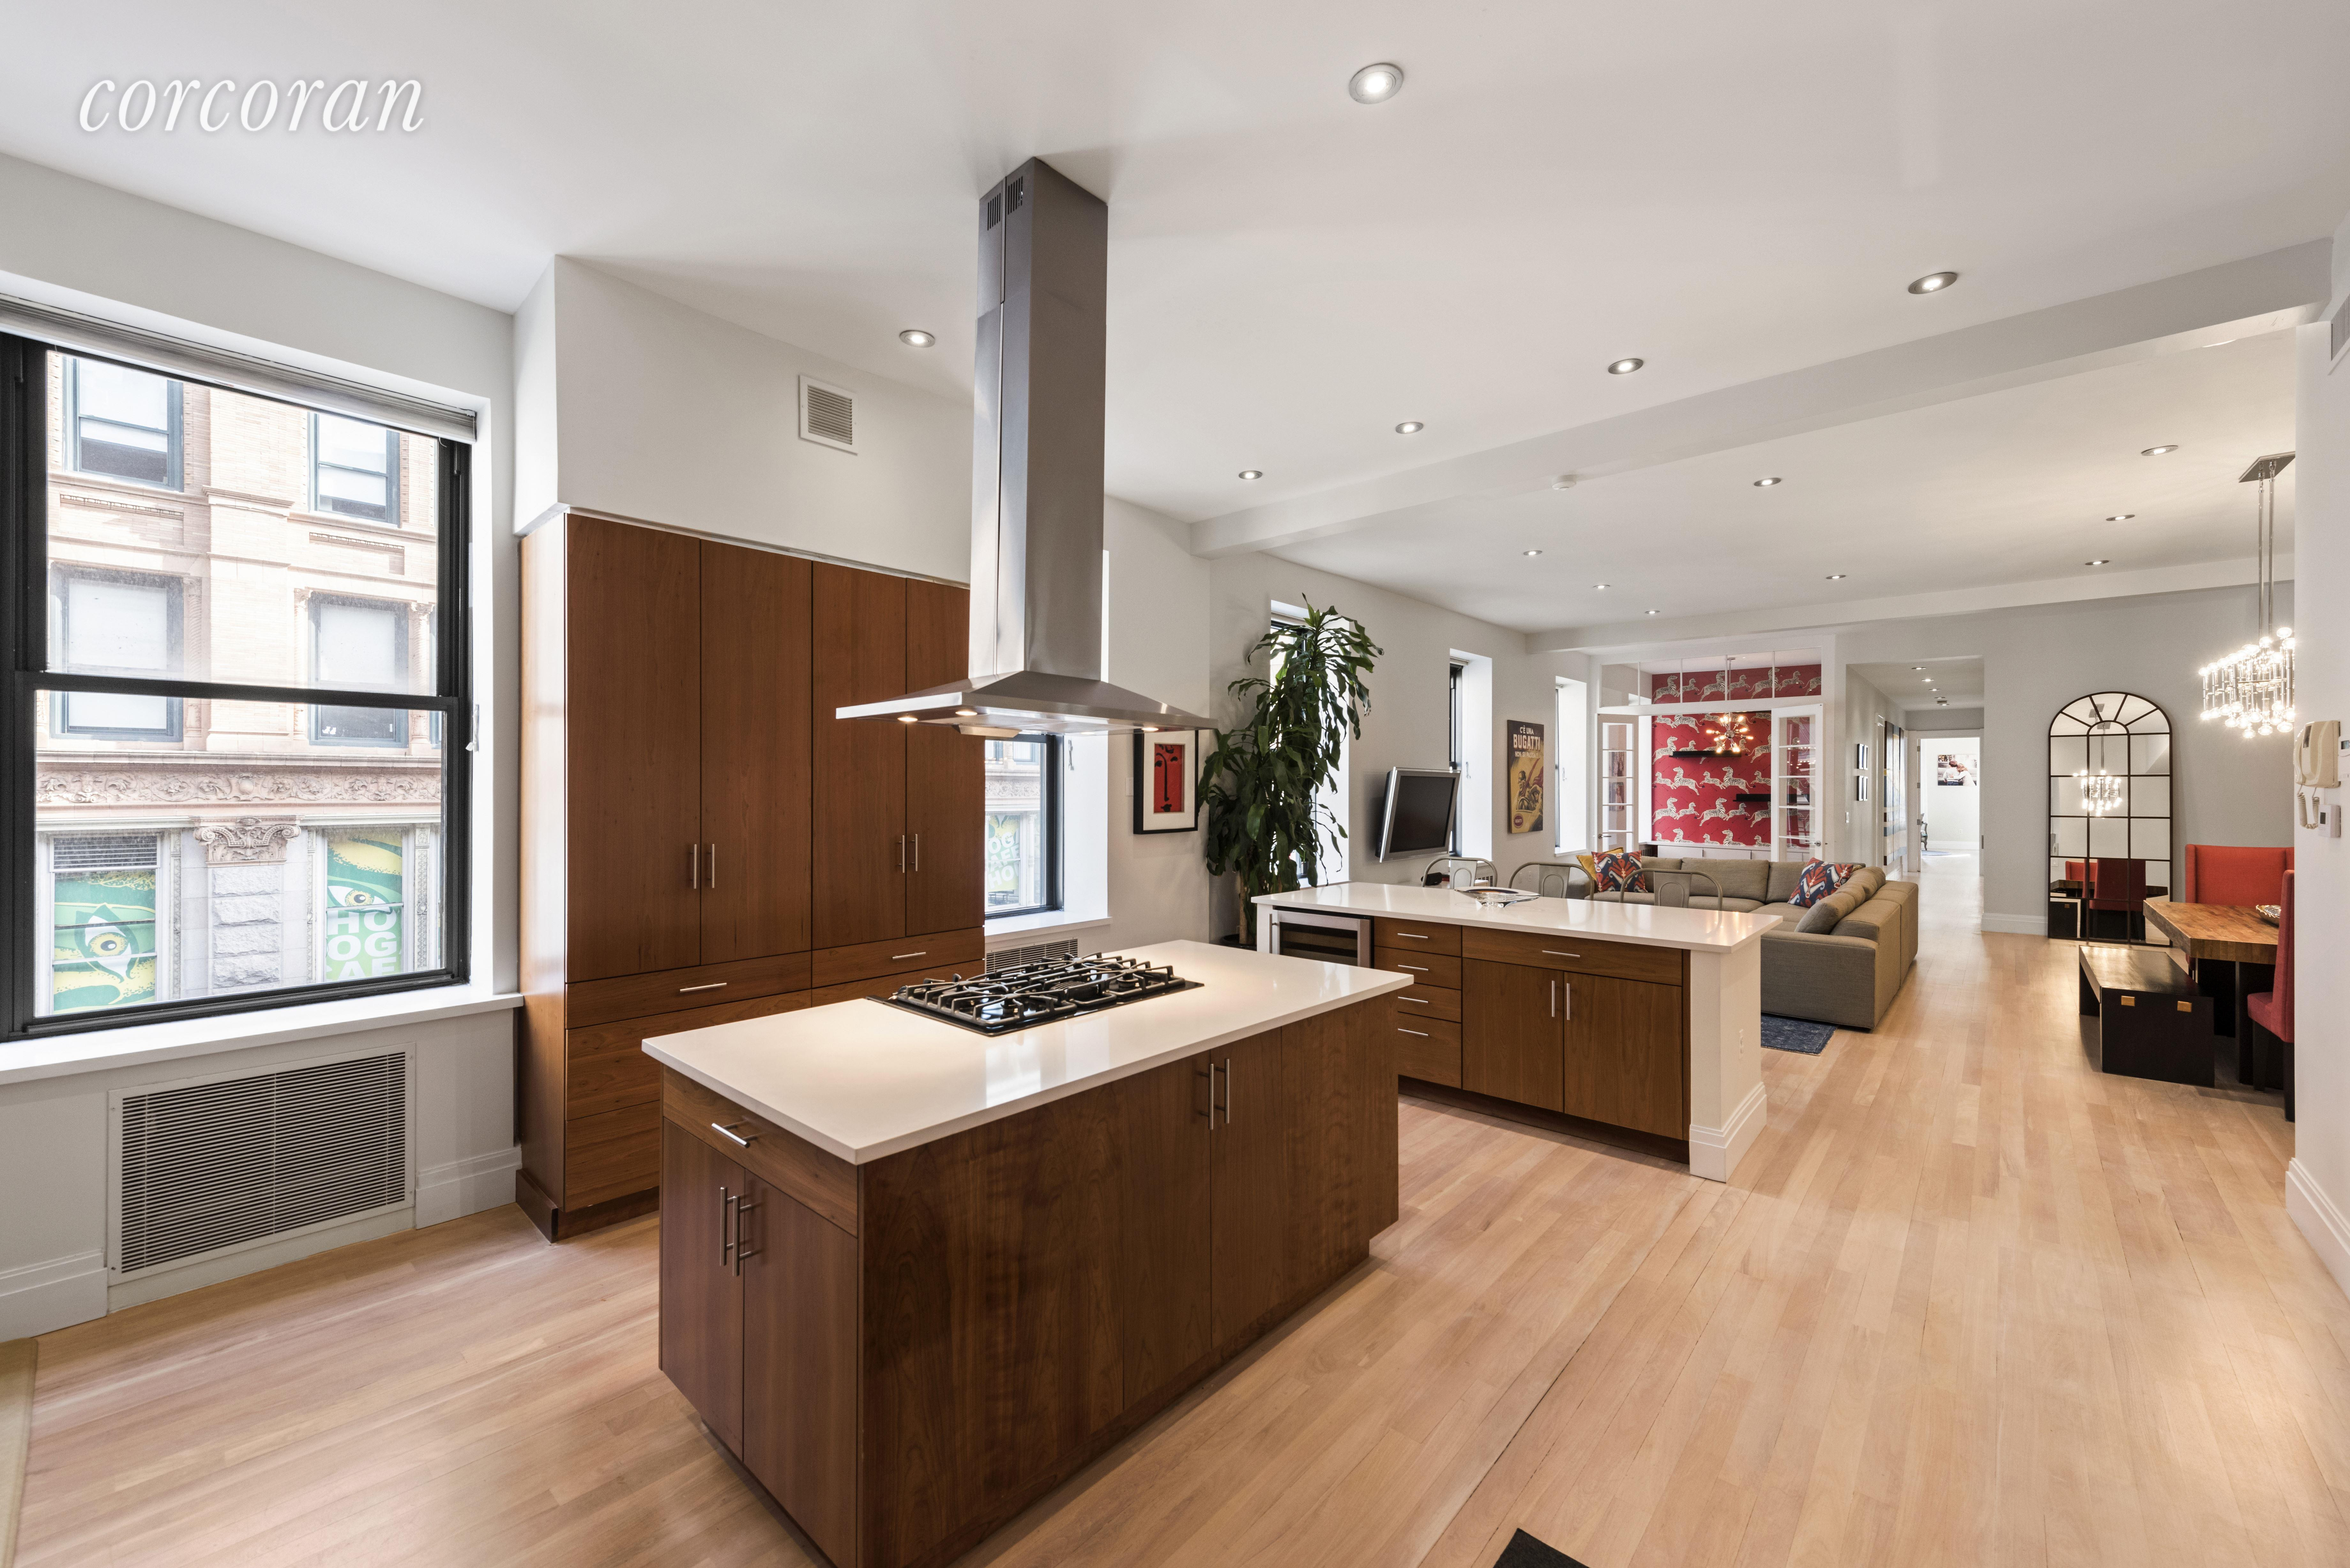 hardwood flooring north york of corcoran brian meier kate meier jamie heinlein matthew pucker in open house